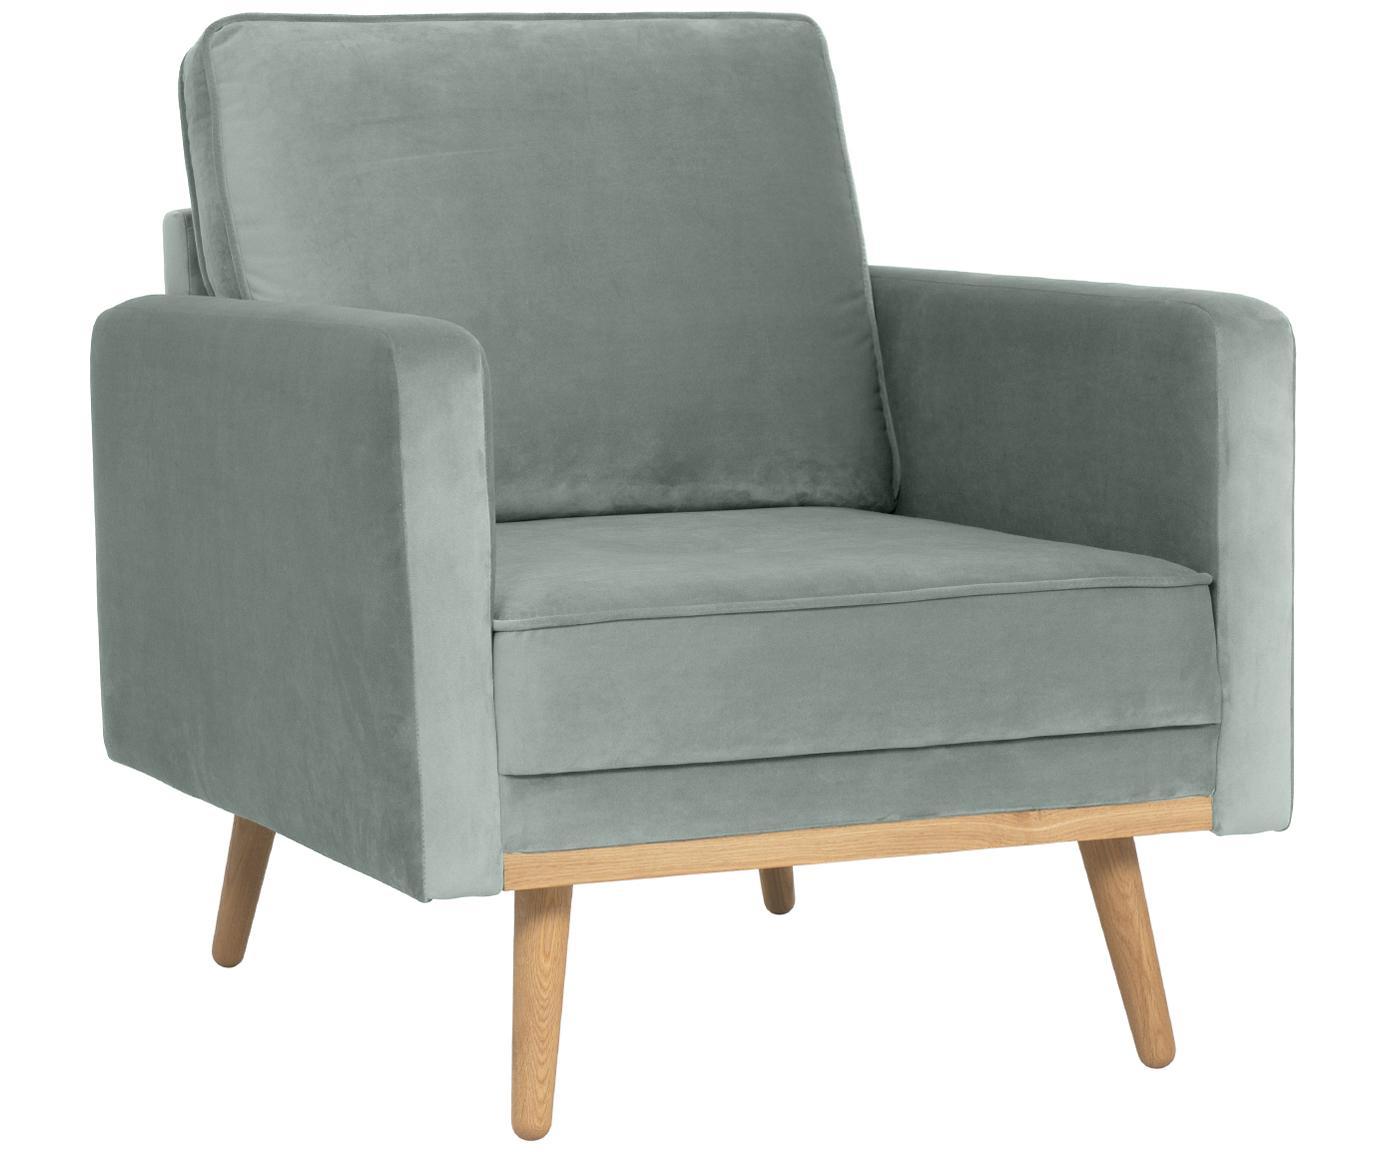 Fluwelen fauteuil Saint, Bekleding: fluweel (polyester), Frame: massief grenenhout, spaan, Bekleding: saliekleurig. Poten en frame: eikenhoutkleurig, B 85 x D 76 cm